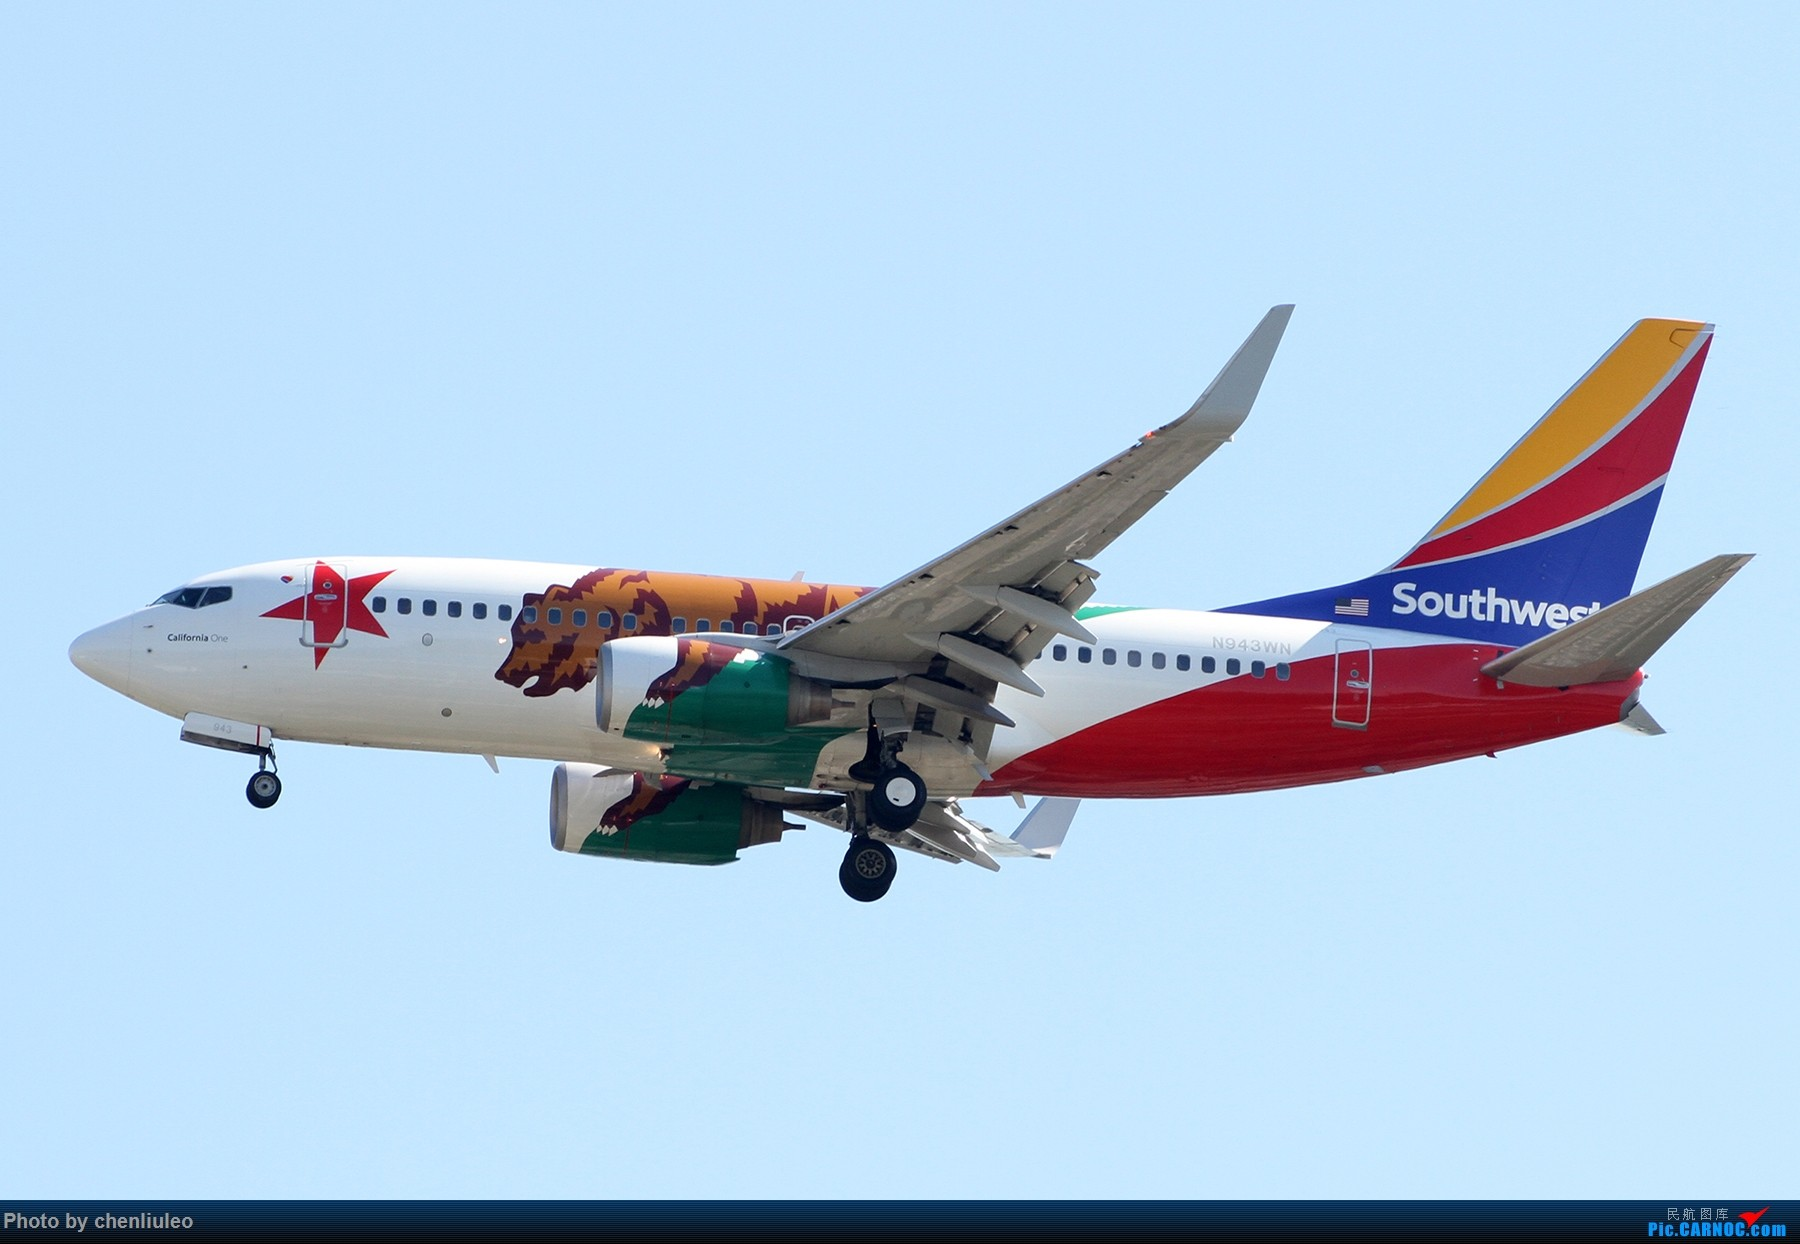 Re:[原创]【北美飞友会】本来是去等西南航空的新加州一号彩绘 结果有意外惊喜 美军C-40C BOEING 737-700 N943WN 美国圣路易斯机场